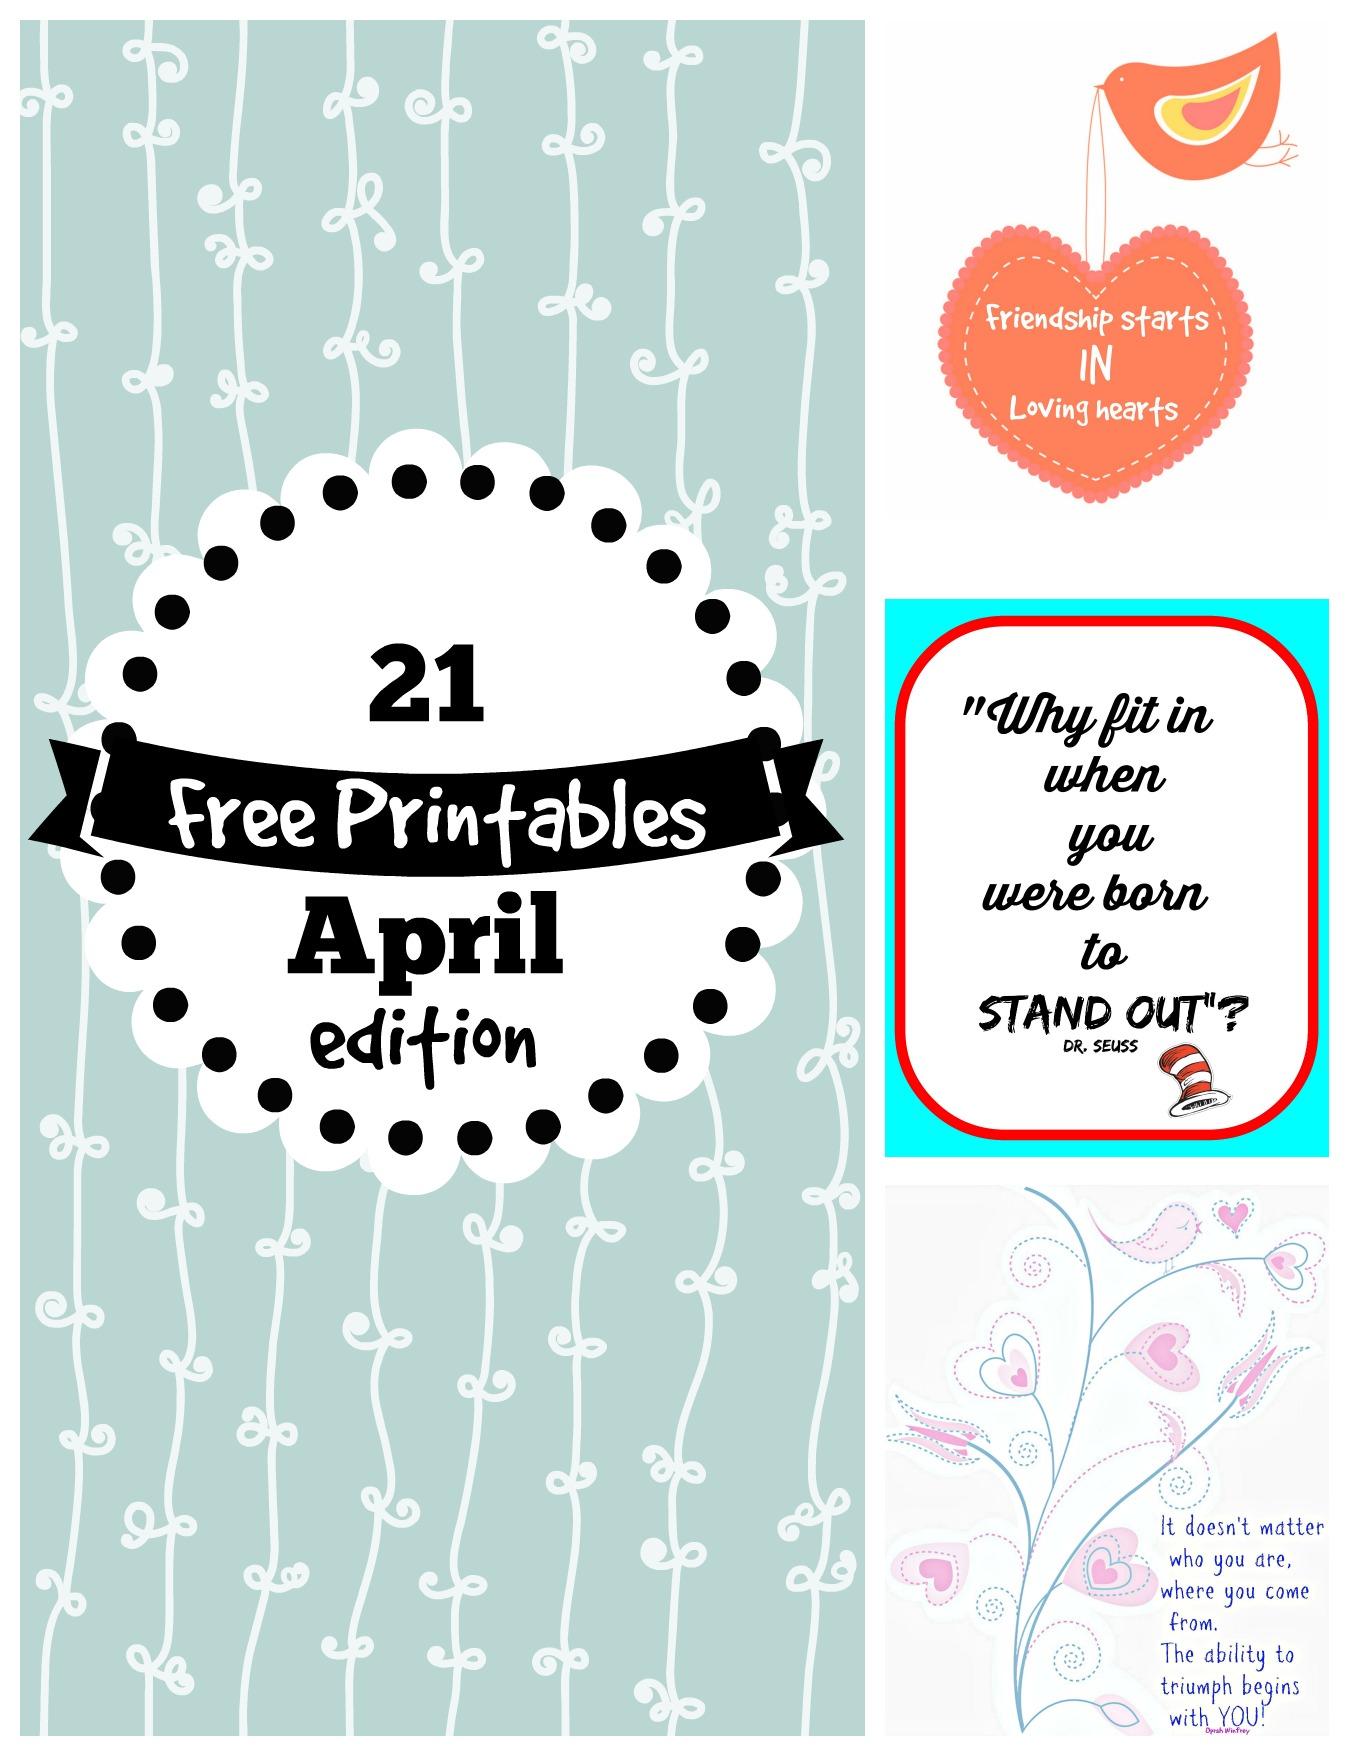 Free Printables For April